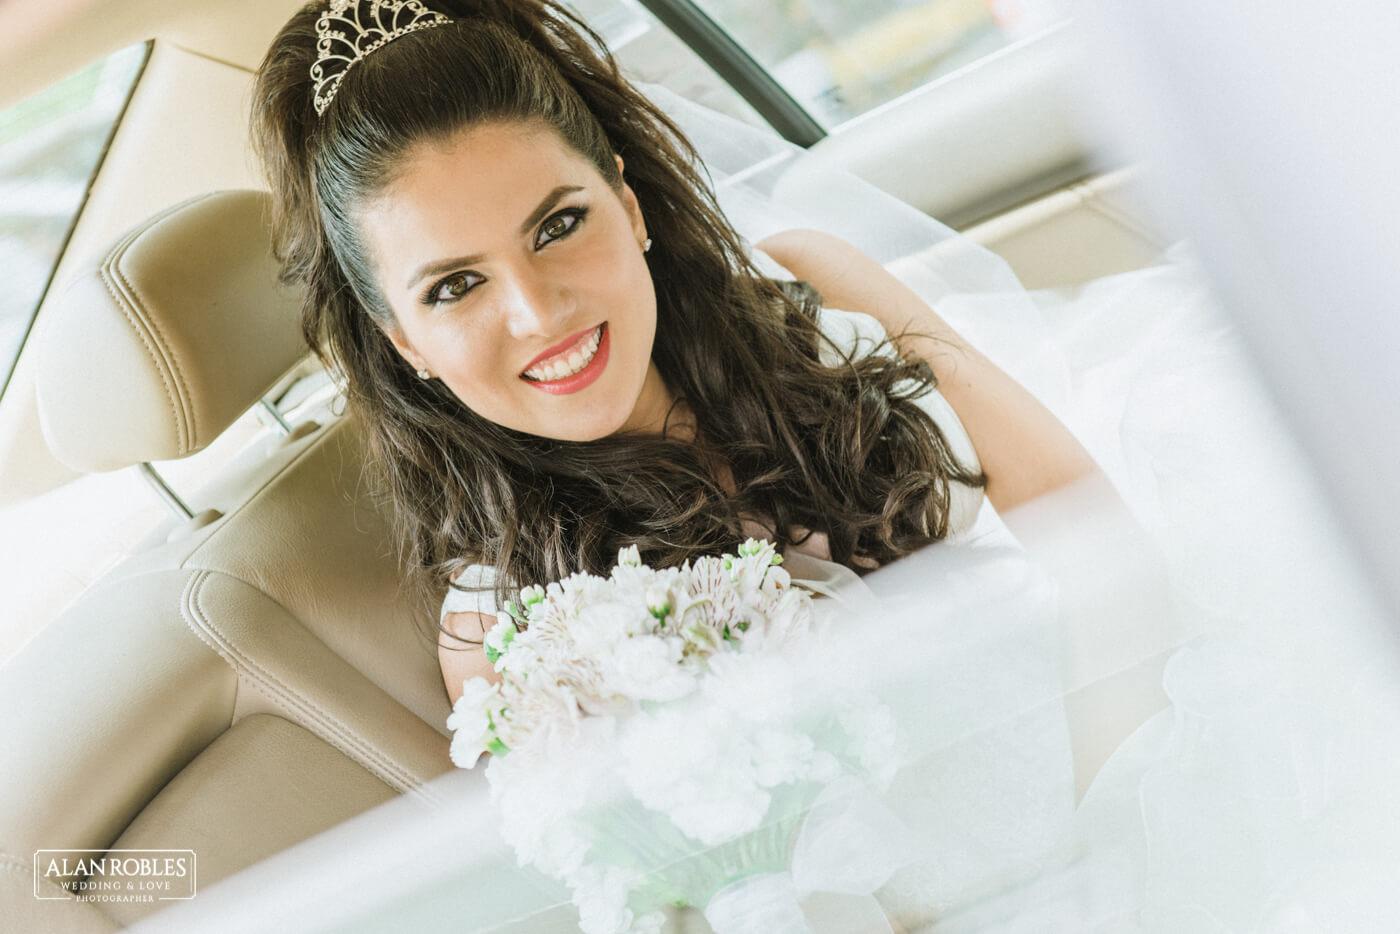 Getting Ready Novia - Alan Robles Wedding & Love Photographer - Fotografo Bodas Guadalajara